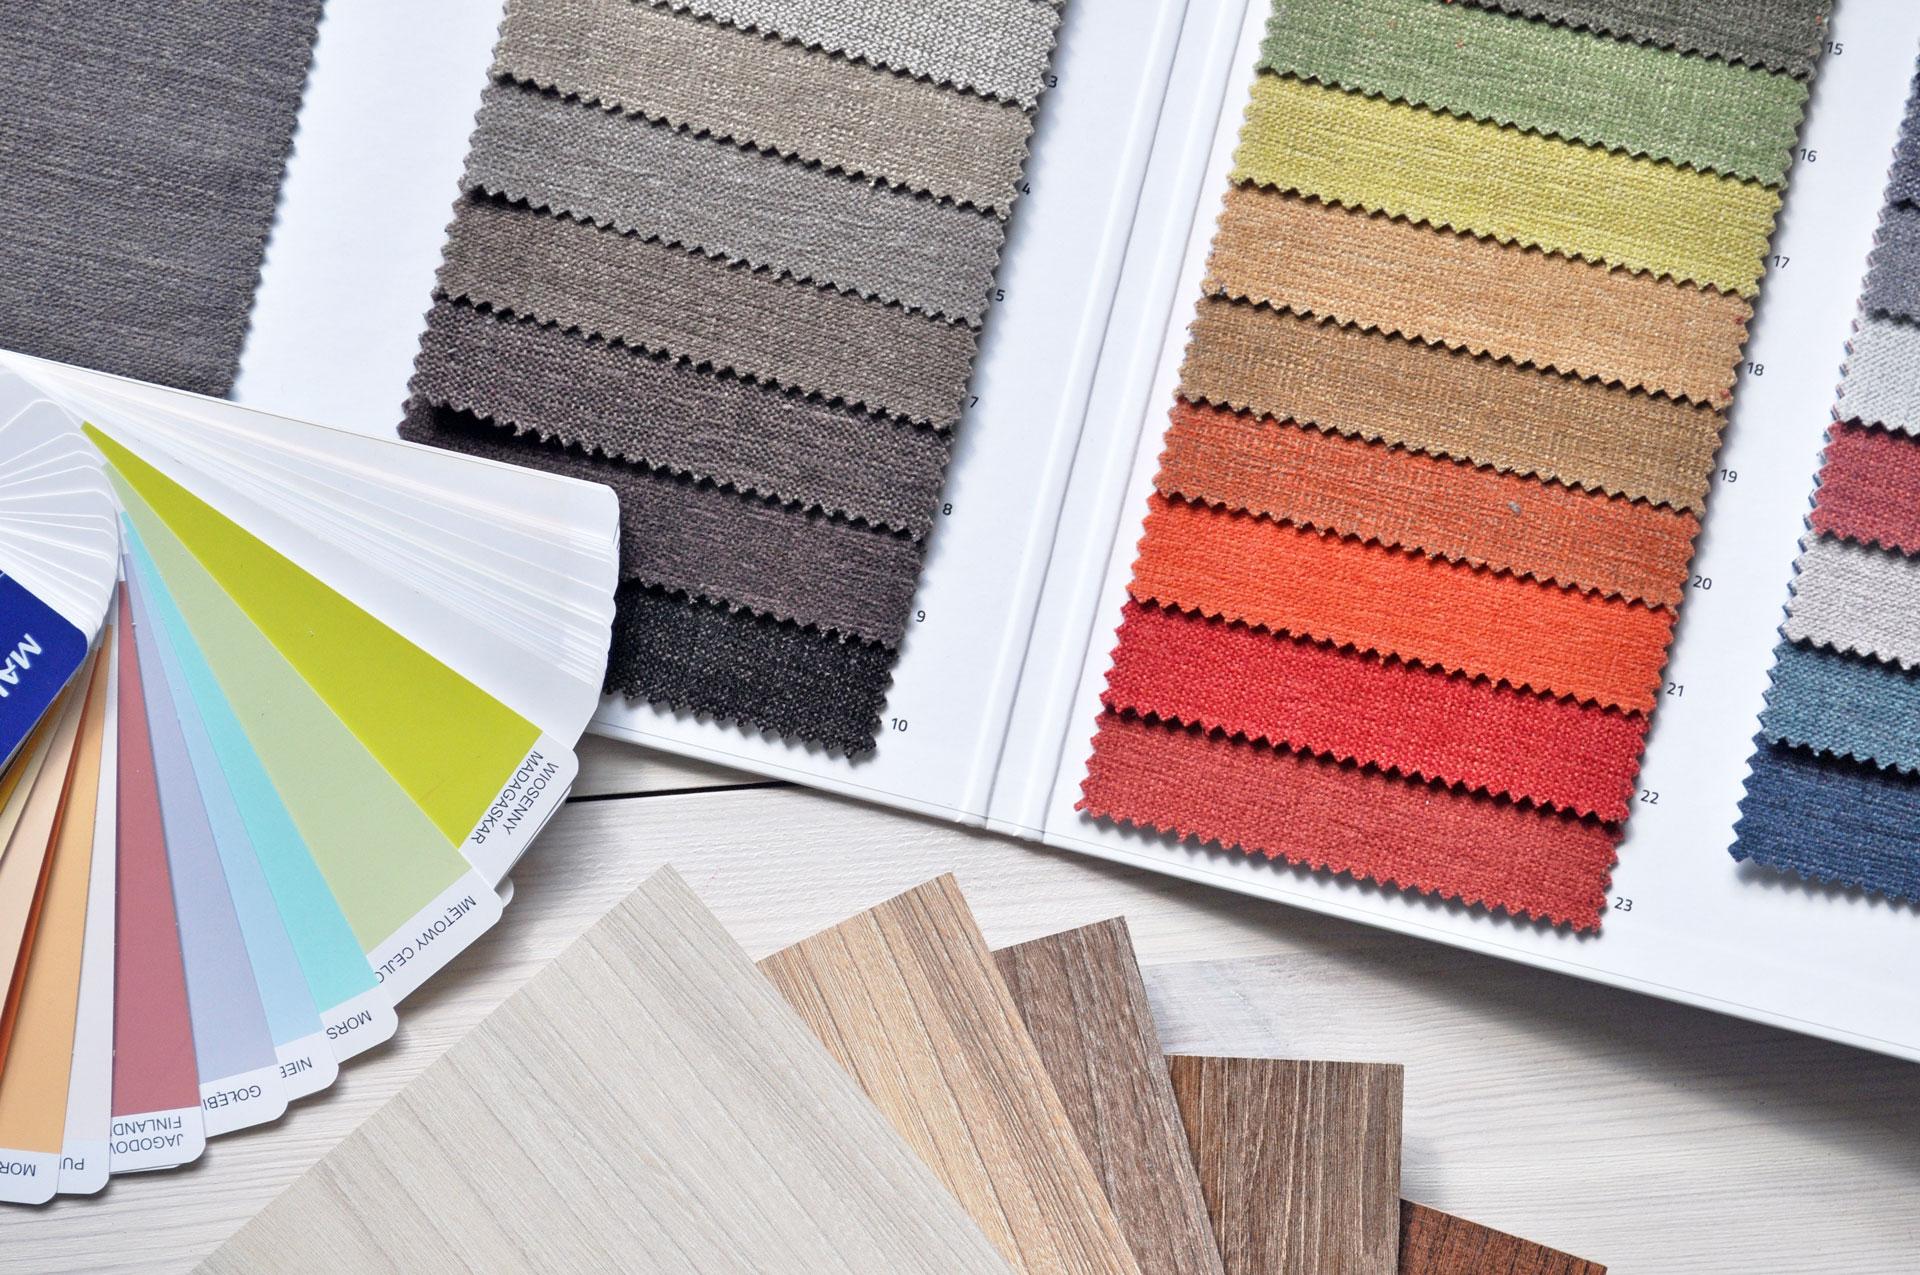 art-business-color-colorful-276267